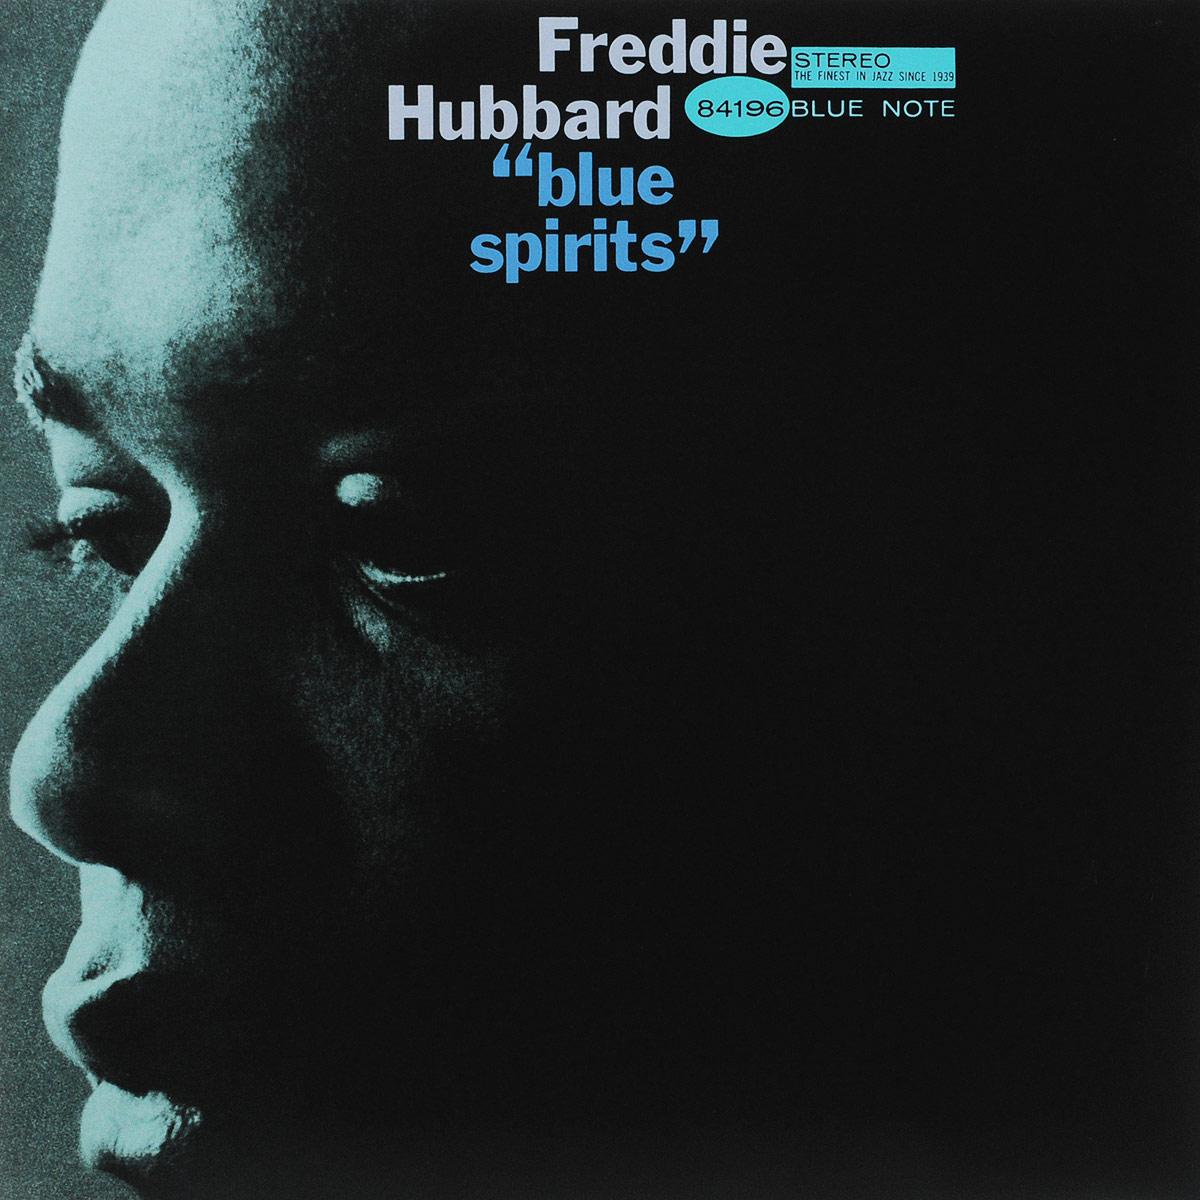 Фредди Хаббард Freddie Hubbard. Blue Spirits (LP) blue note